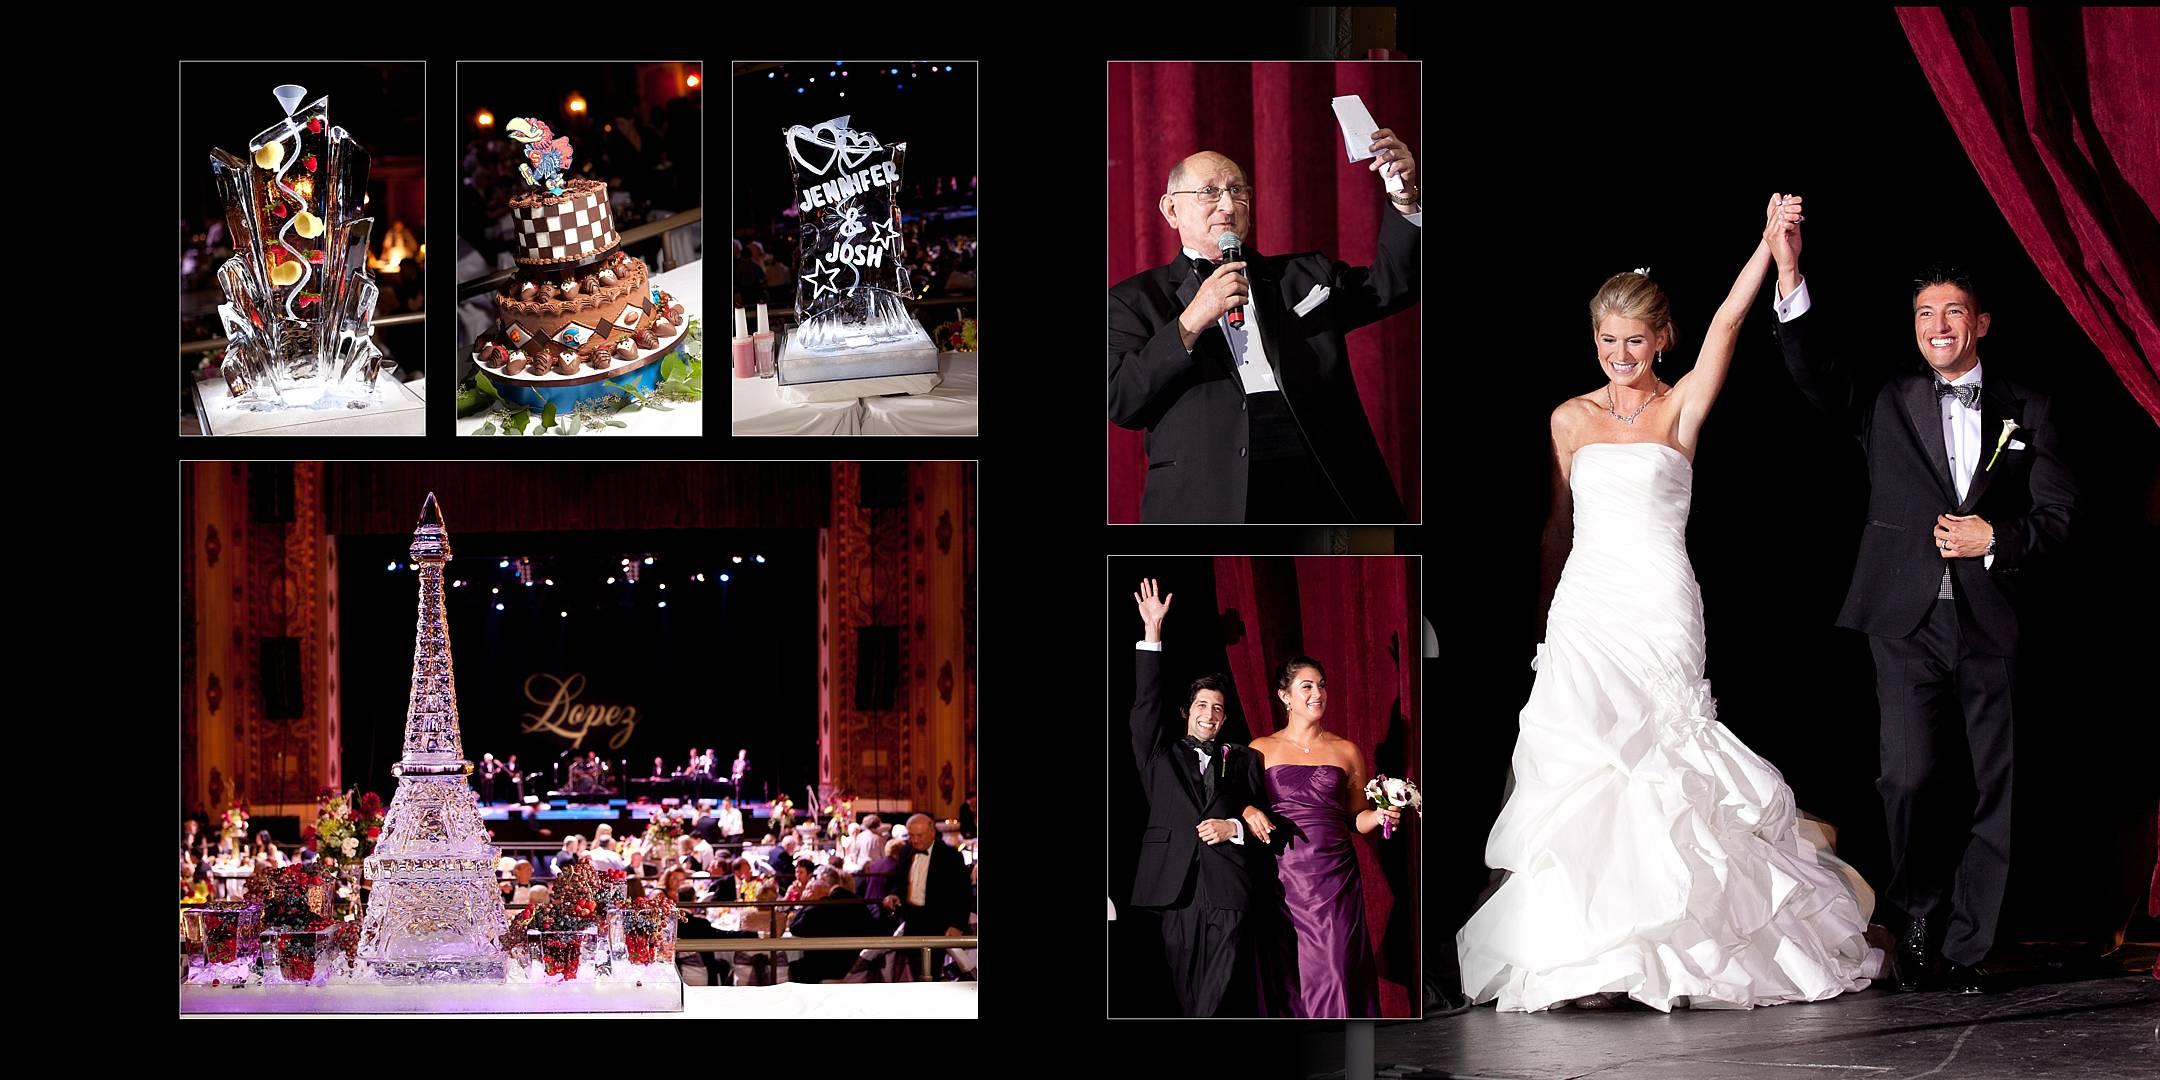 schmidt-photo-wedding-photography-chicago_2305